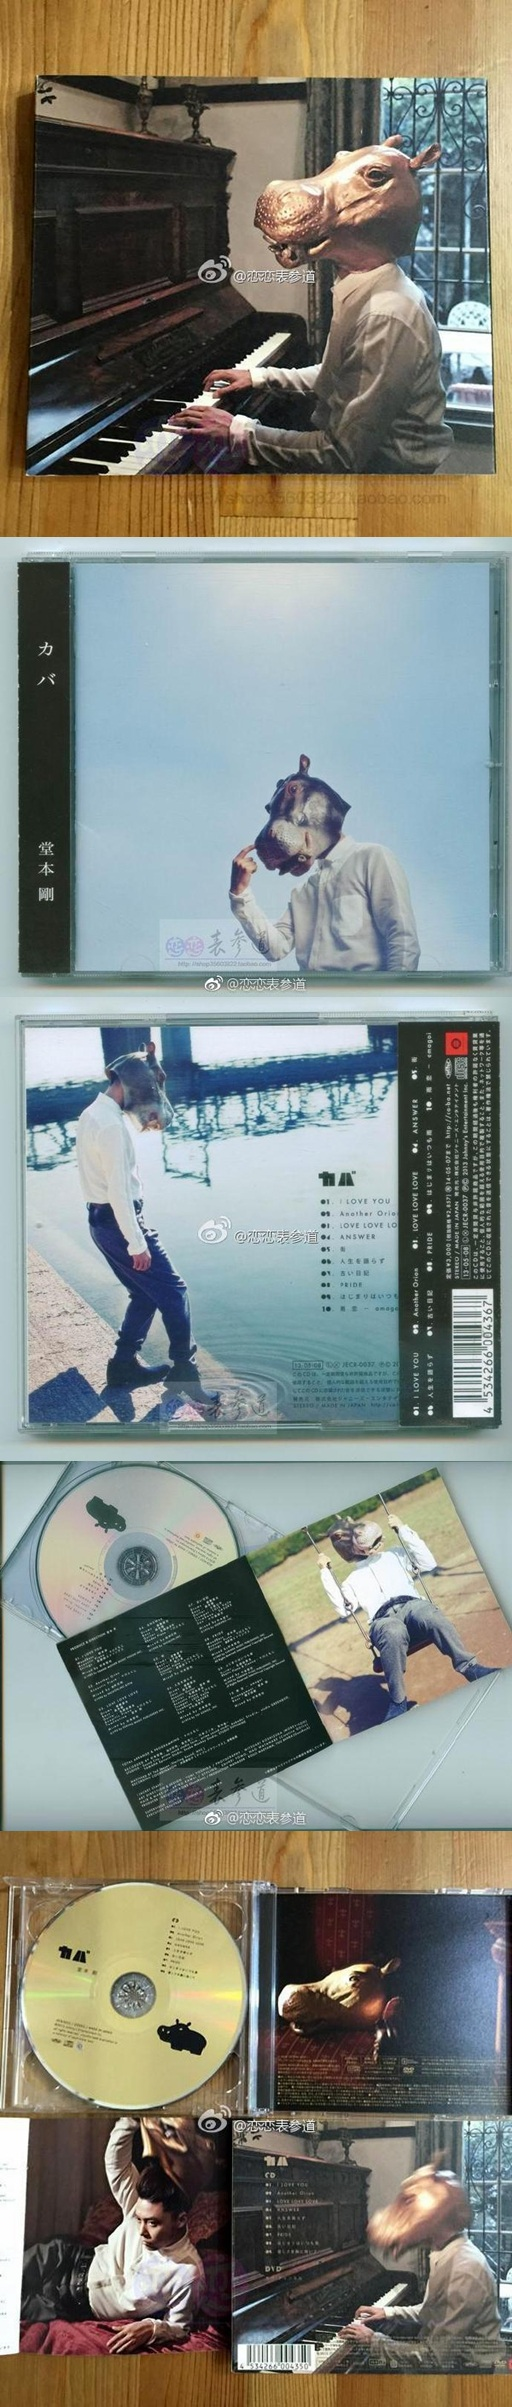 堂本刚 Album 翻唱专「カバ」初回/通常